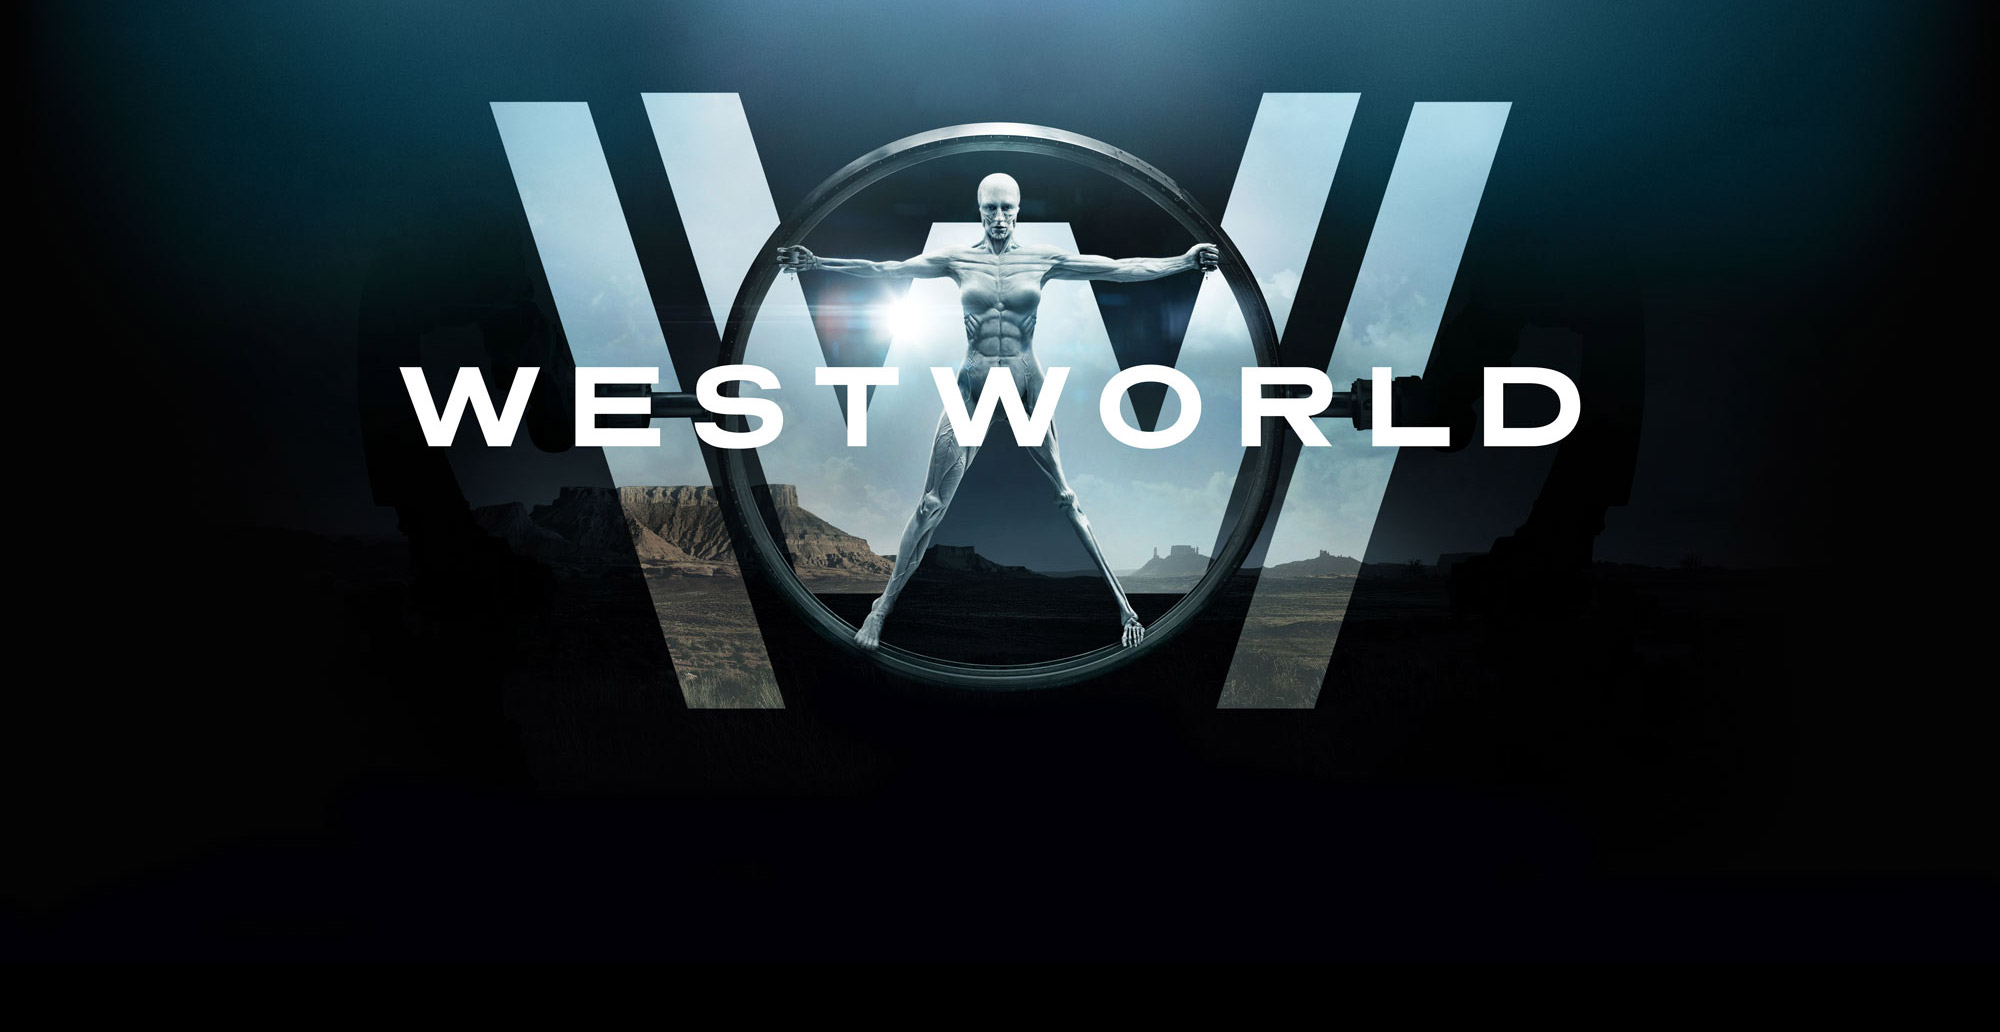 ווסט וורלד: עולם שעשועים פטריאכלי ומרד פמיניסטי